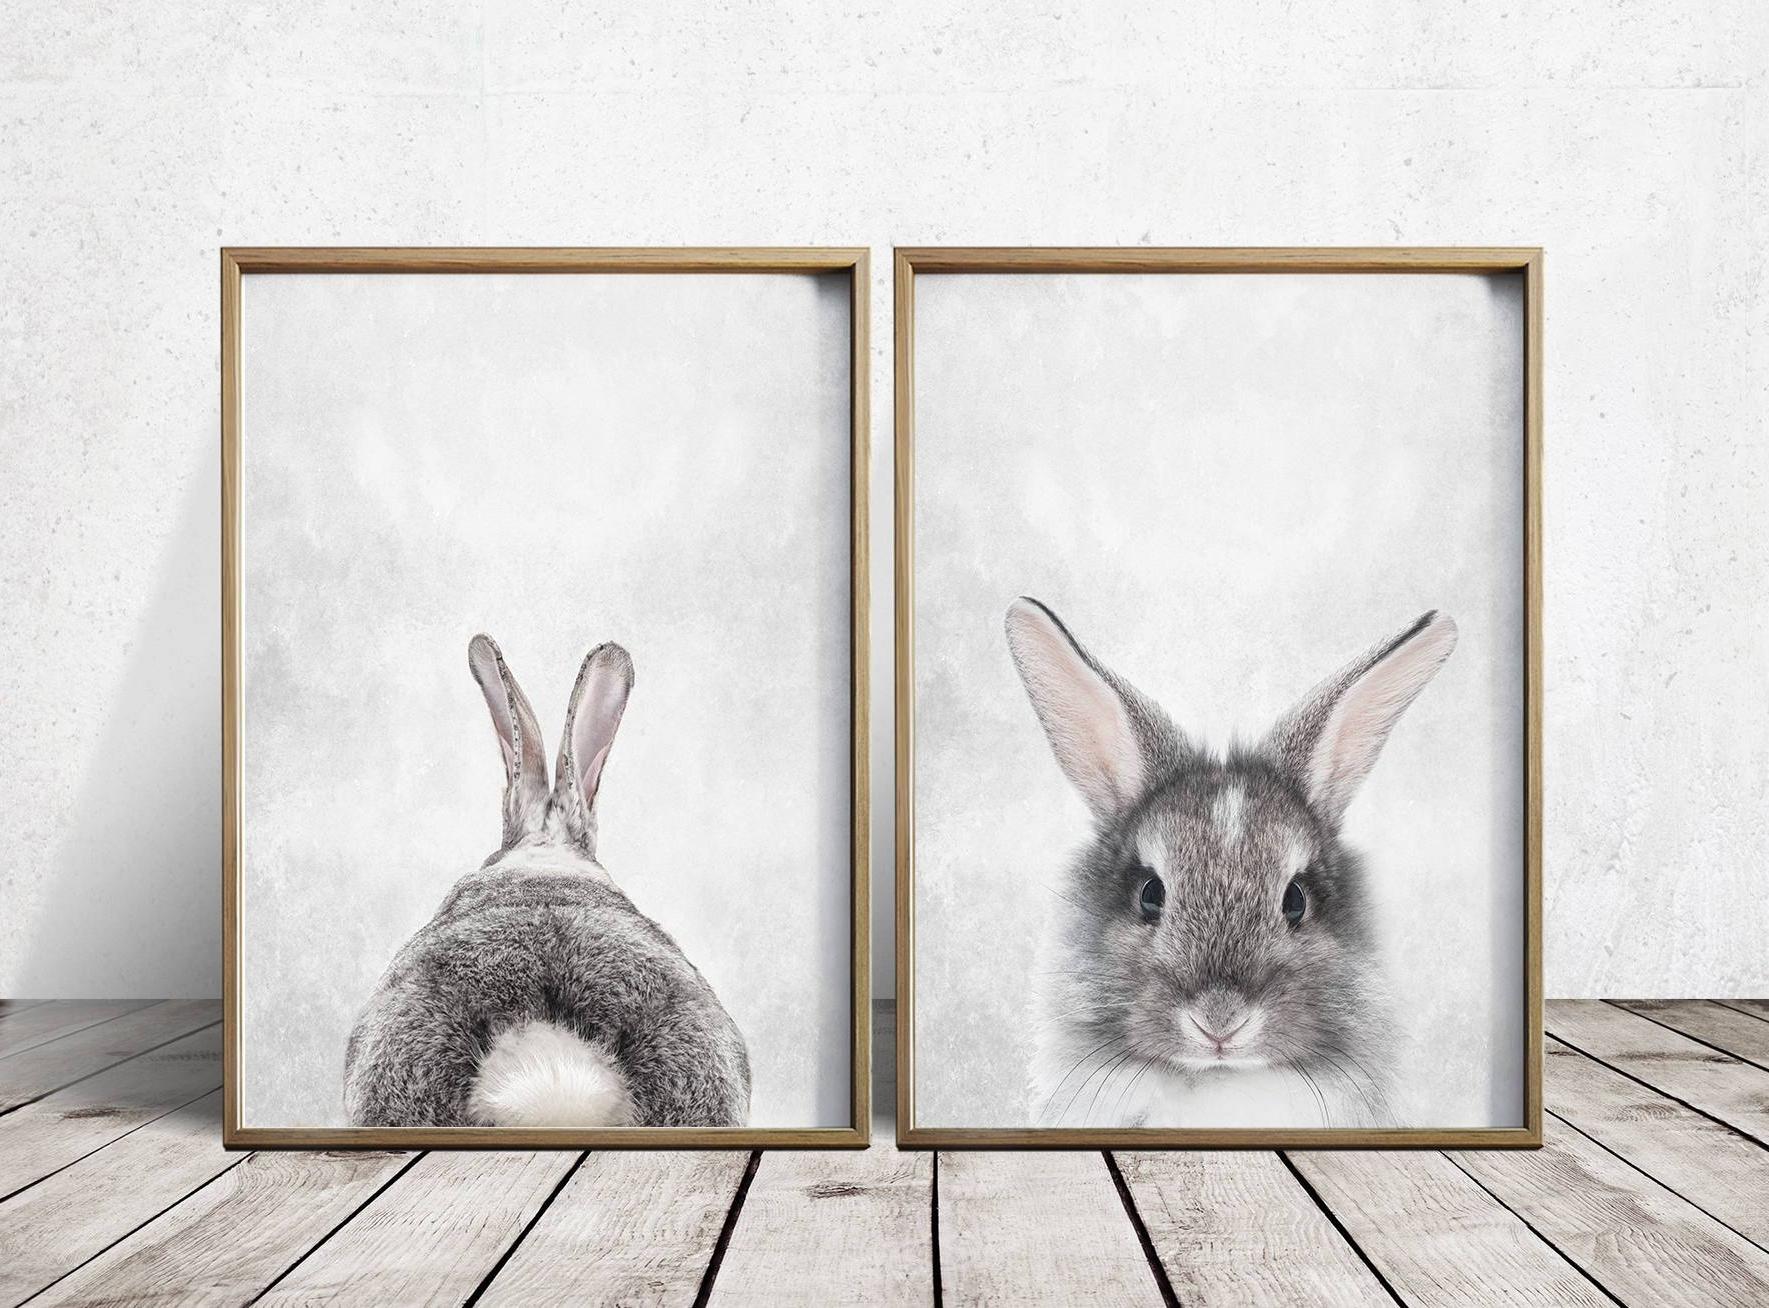 Bunny Wall Art With Regard To Newest Nursery Wall Art Nursery Decor Gray Rabbit Print Bunny, Vintage (View 5 of 15)